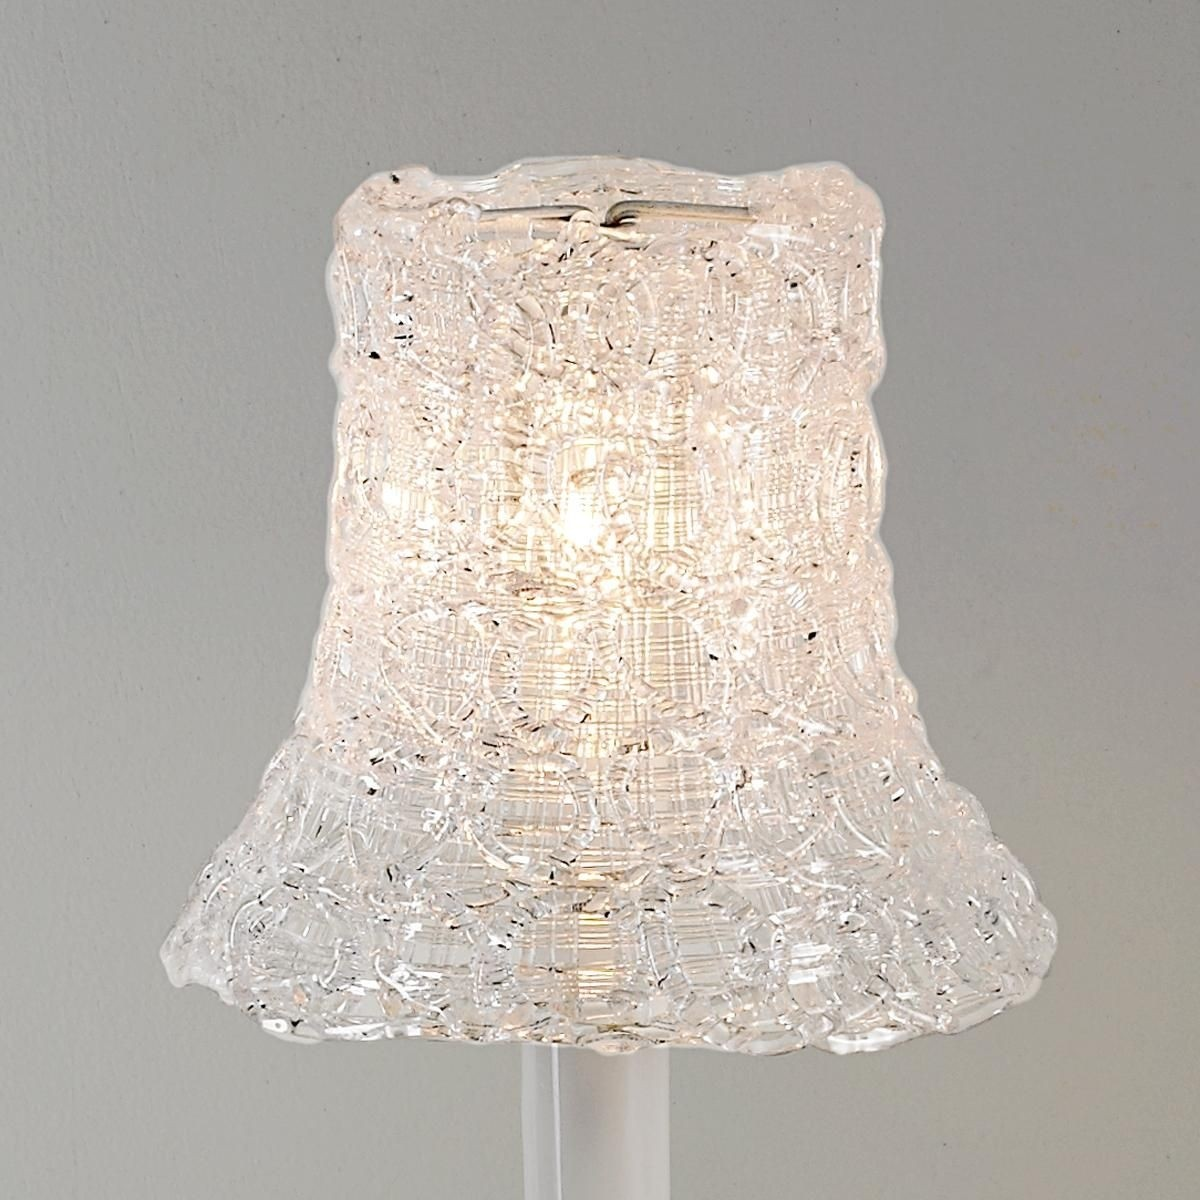 Mini Chandelier Lamp Shades Foter